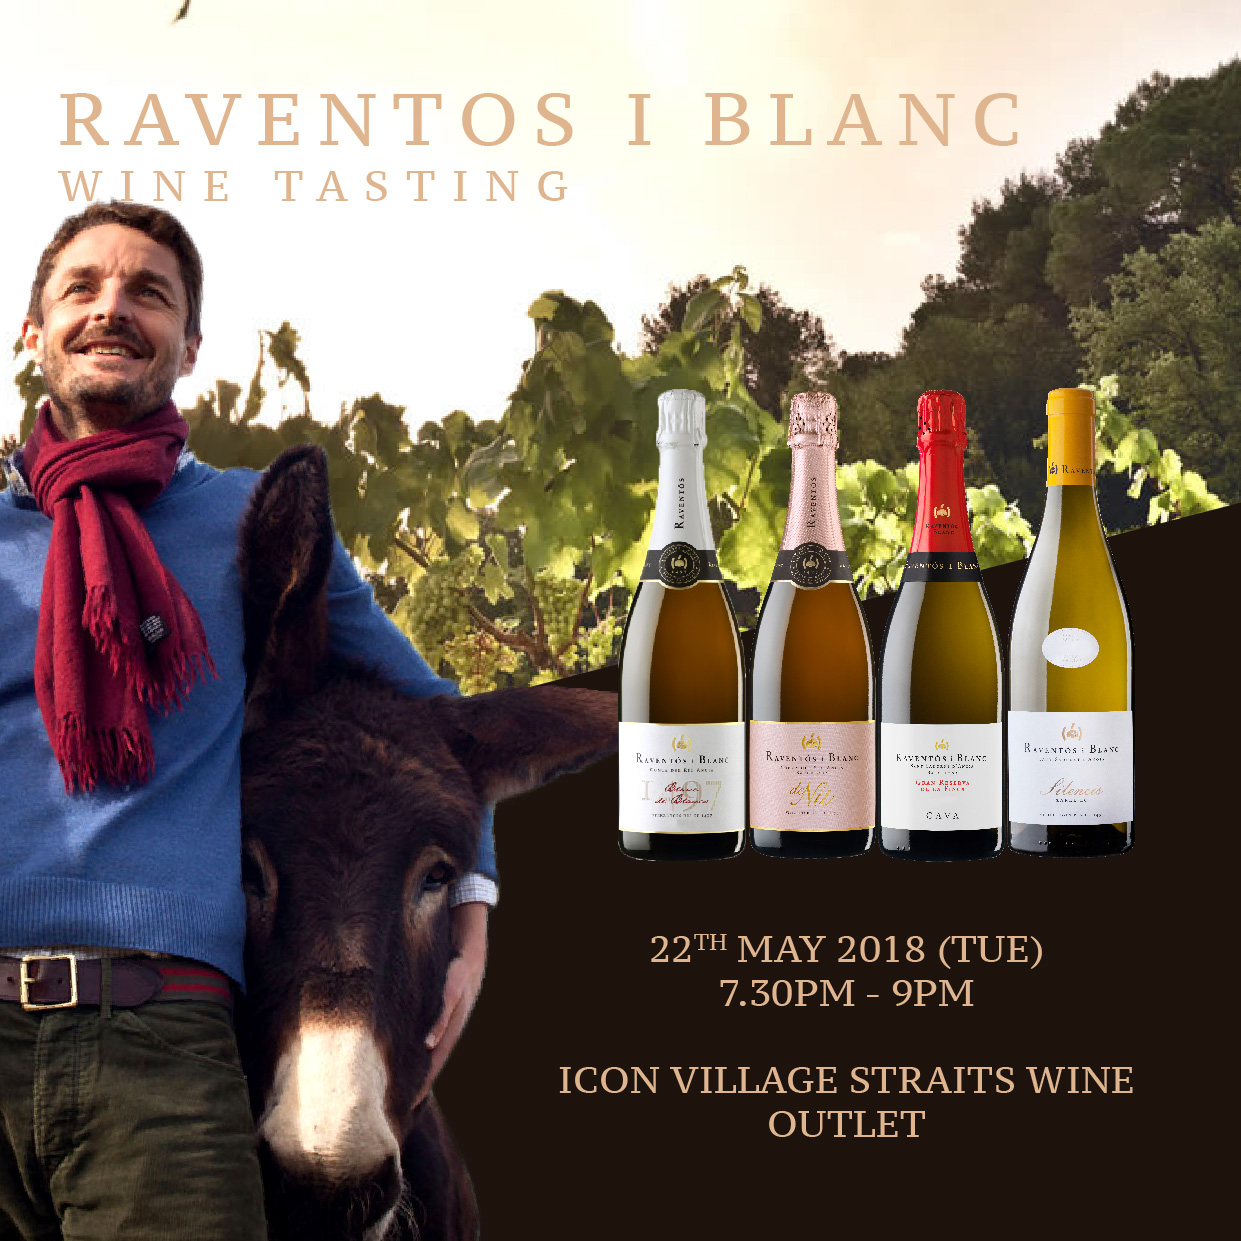 Raventos i Blanc Wine Tasting Event